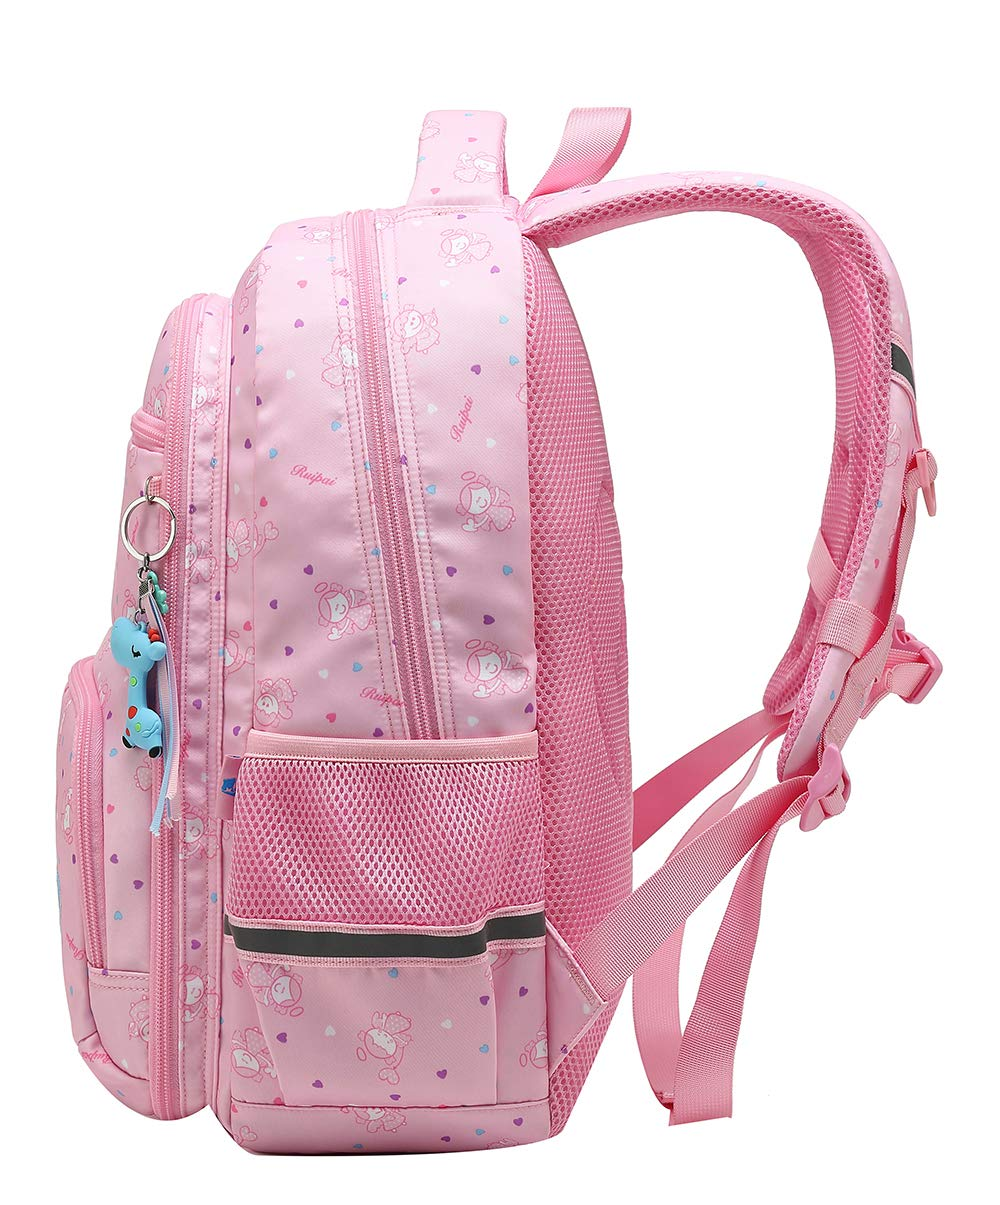 71P3wlUwKBL - SellerFun UKXB106 - Mochila Infantil Niños, 22 L Style B Pink (Rosa) - UKXB426E1